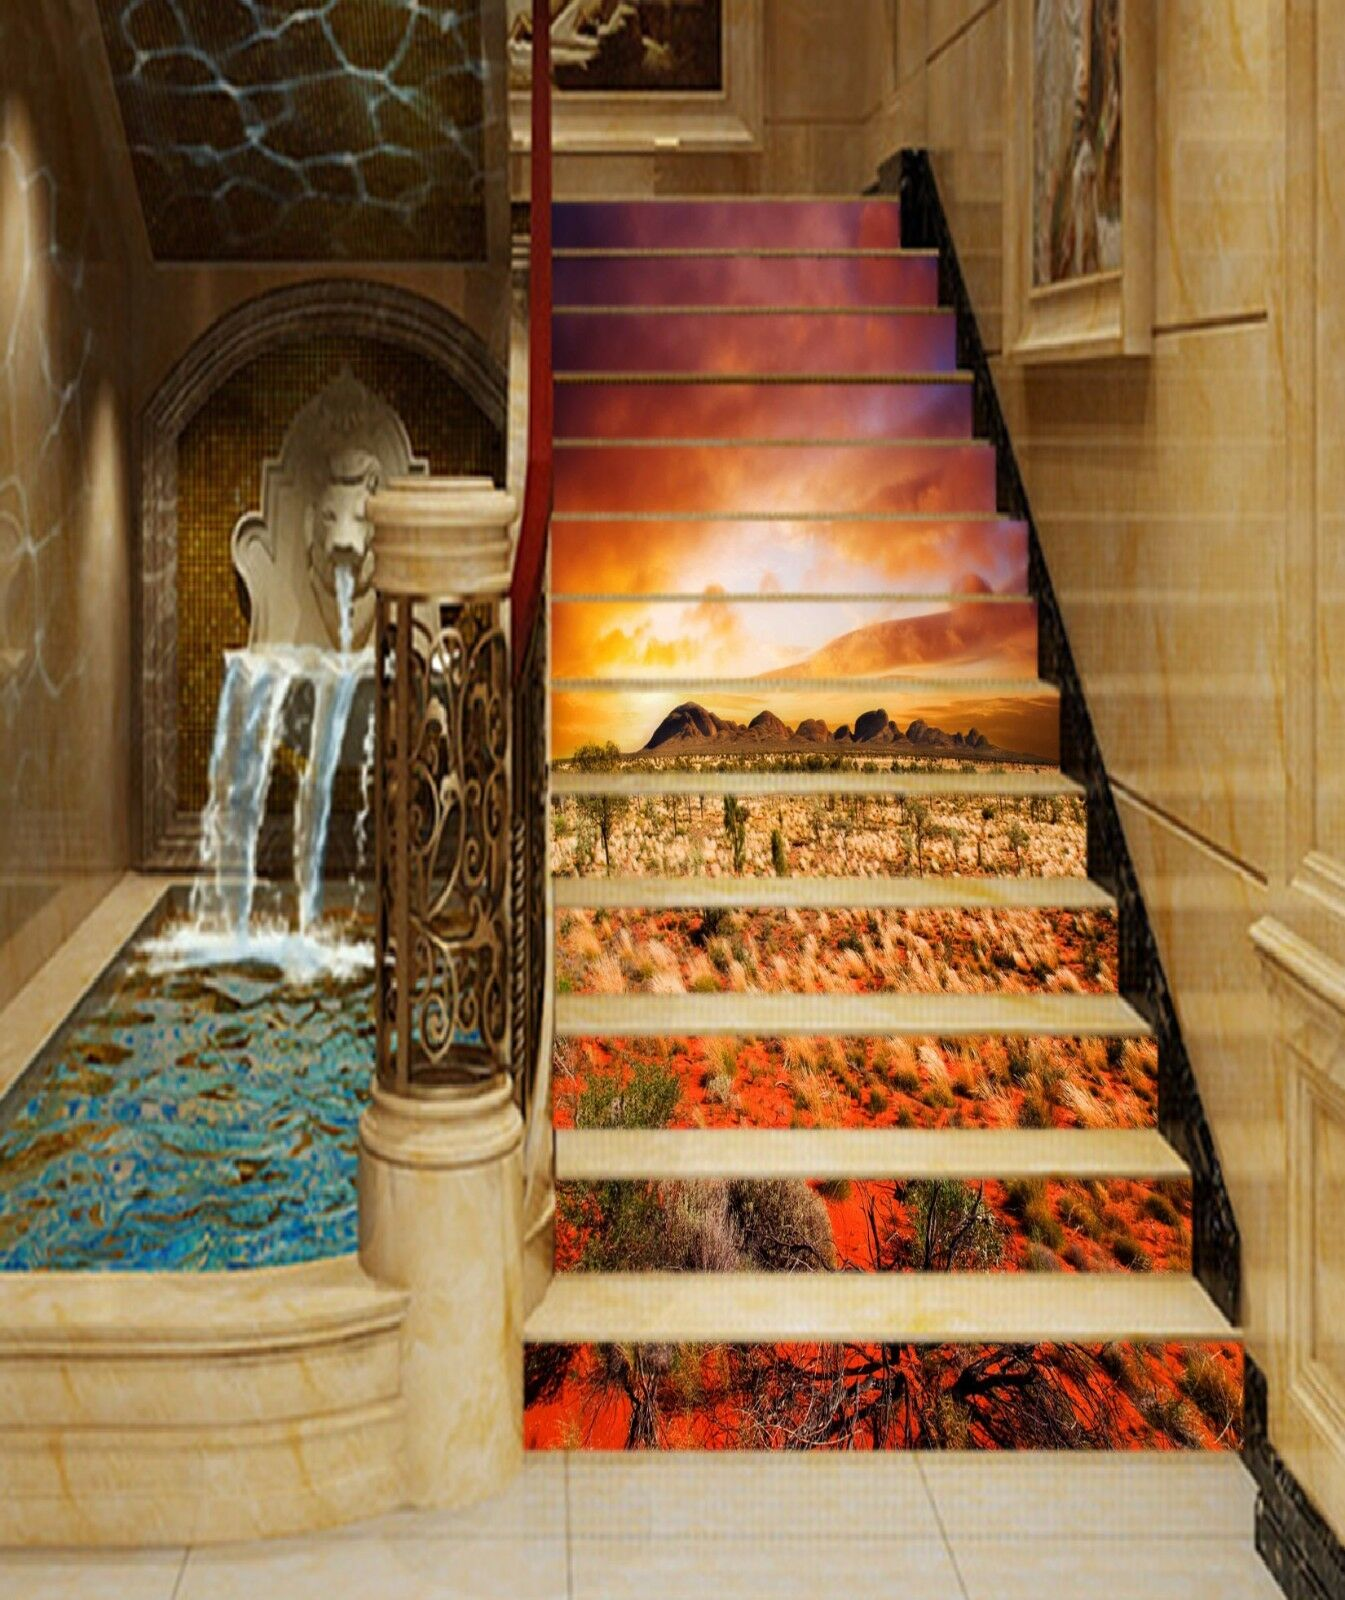 3D Dusk Grassland 8 Stair Risers Decoration Photo Mural Vinyl Decal WandPapier AU